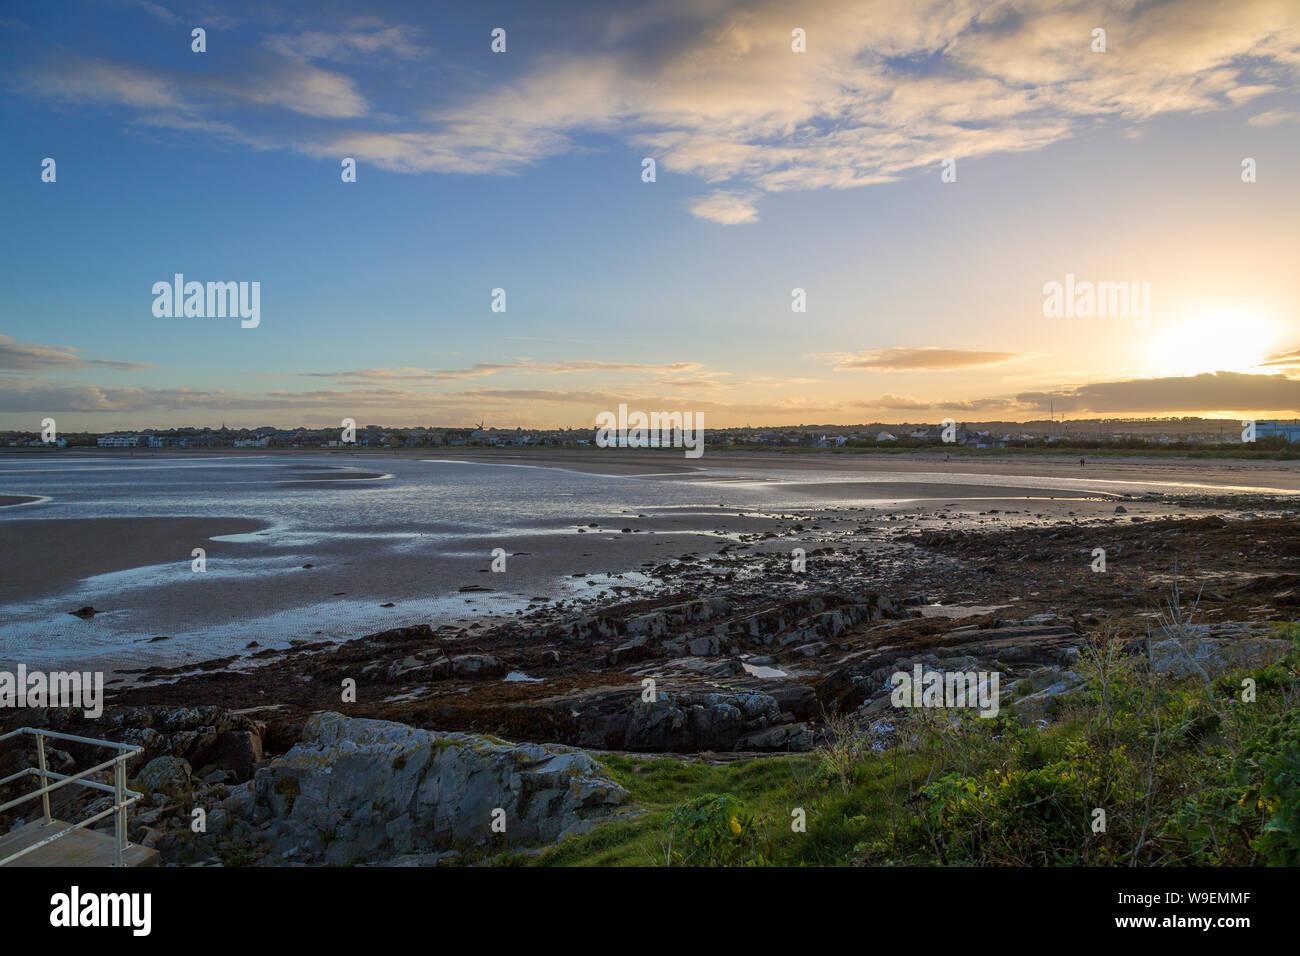 Princess Annes lighthouse visit illuminates rich Dublin history